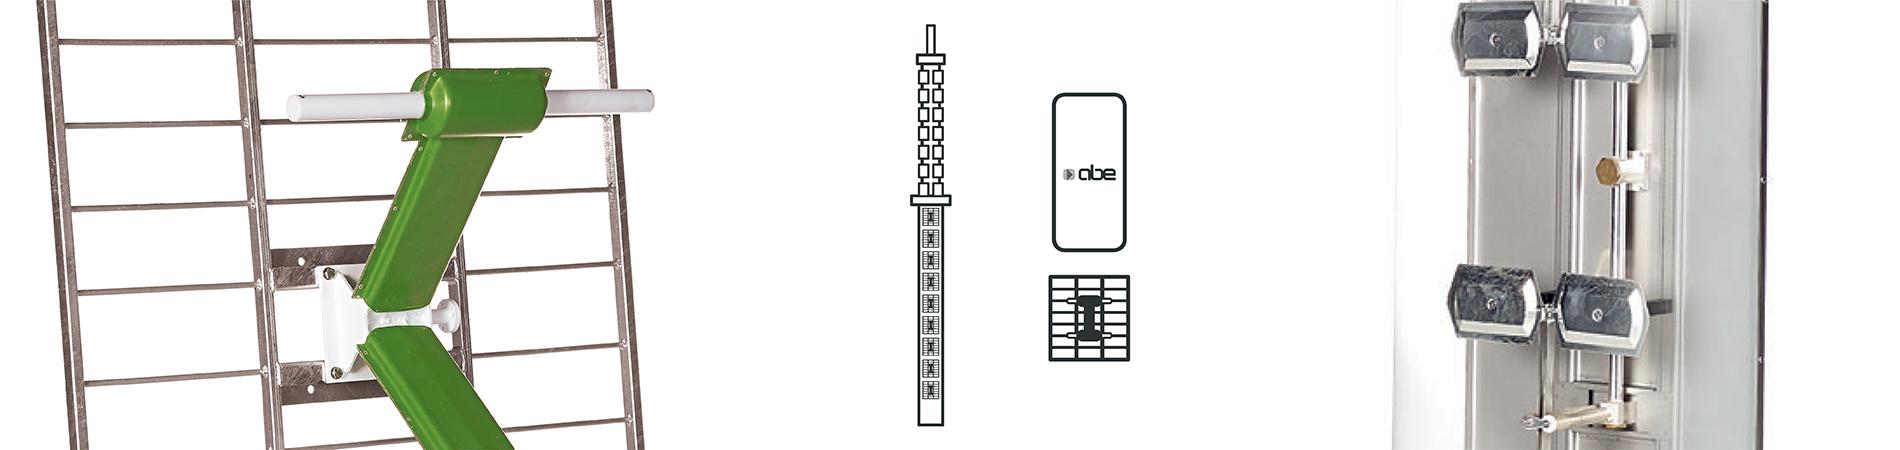 ANTENNE VHF/UHF